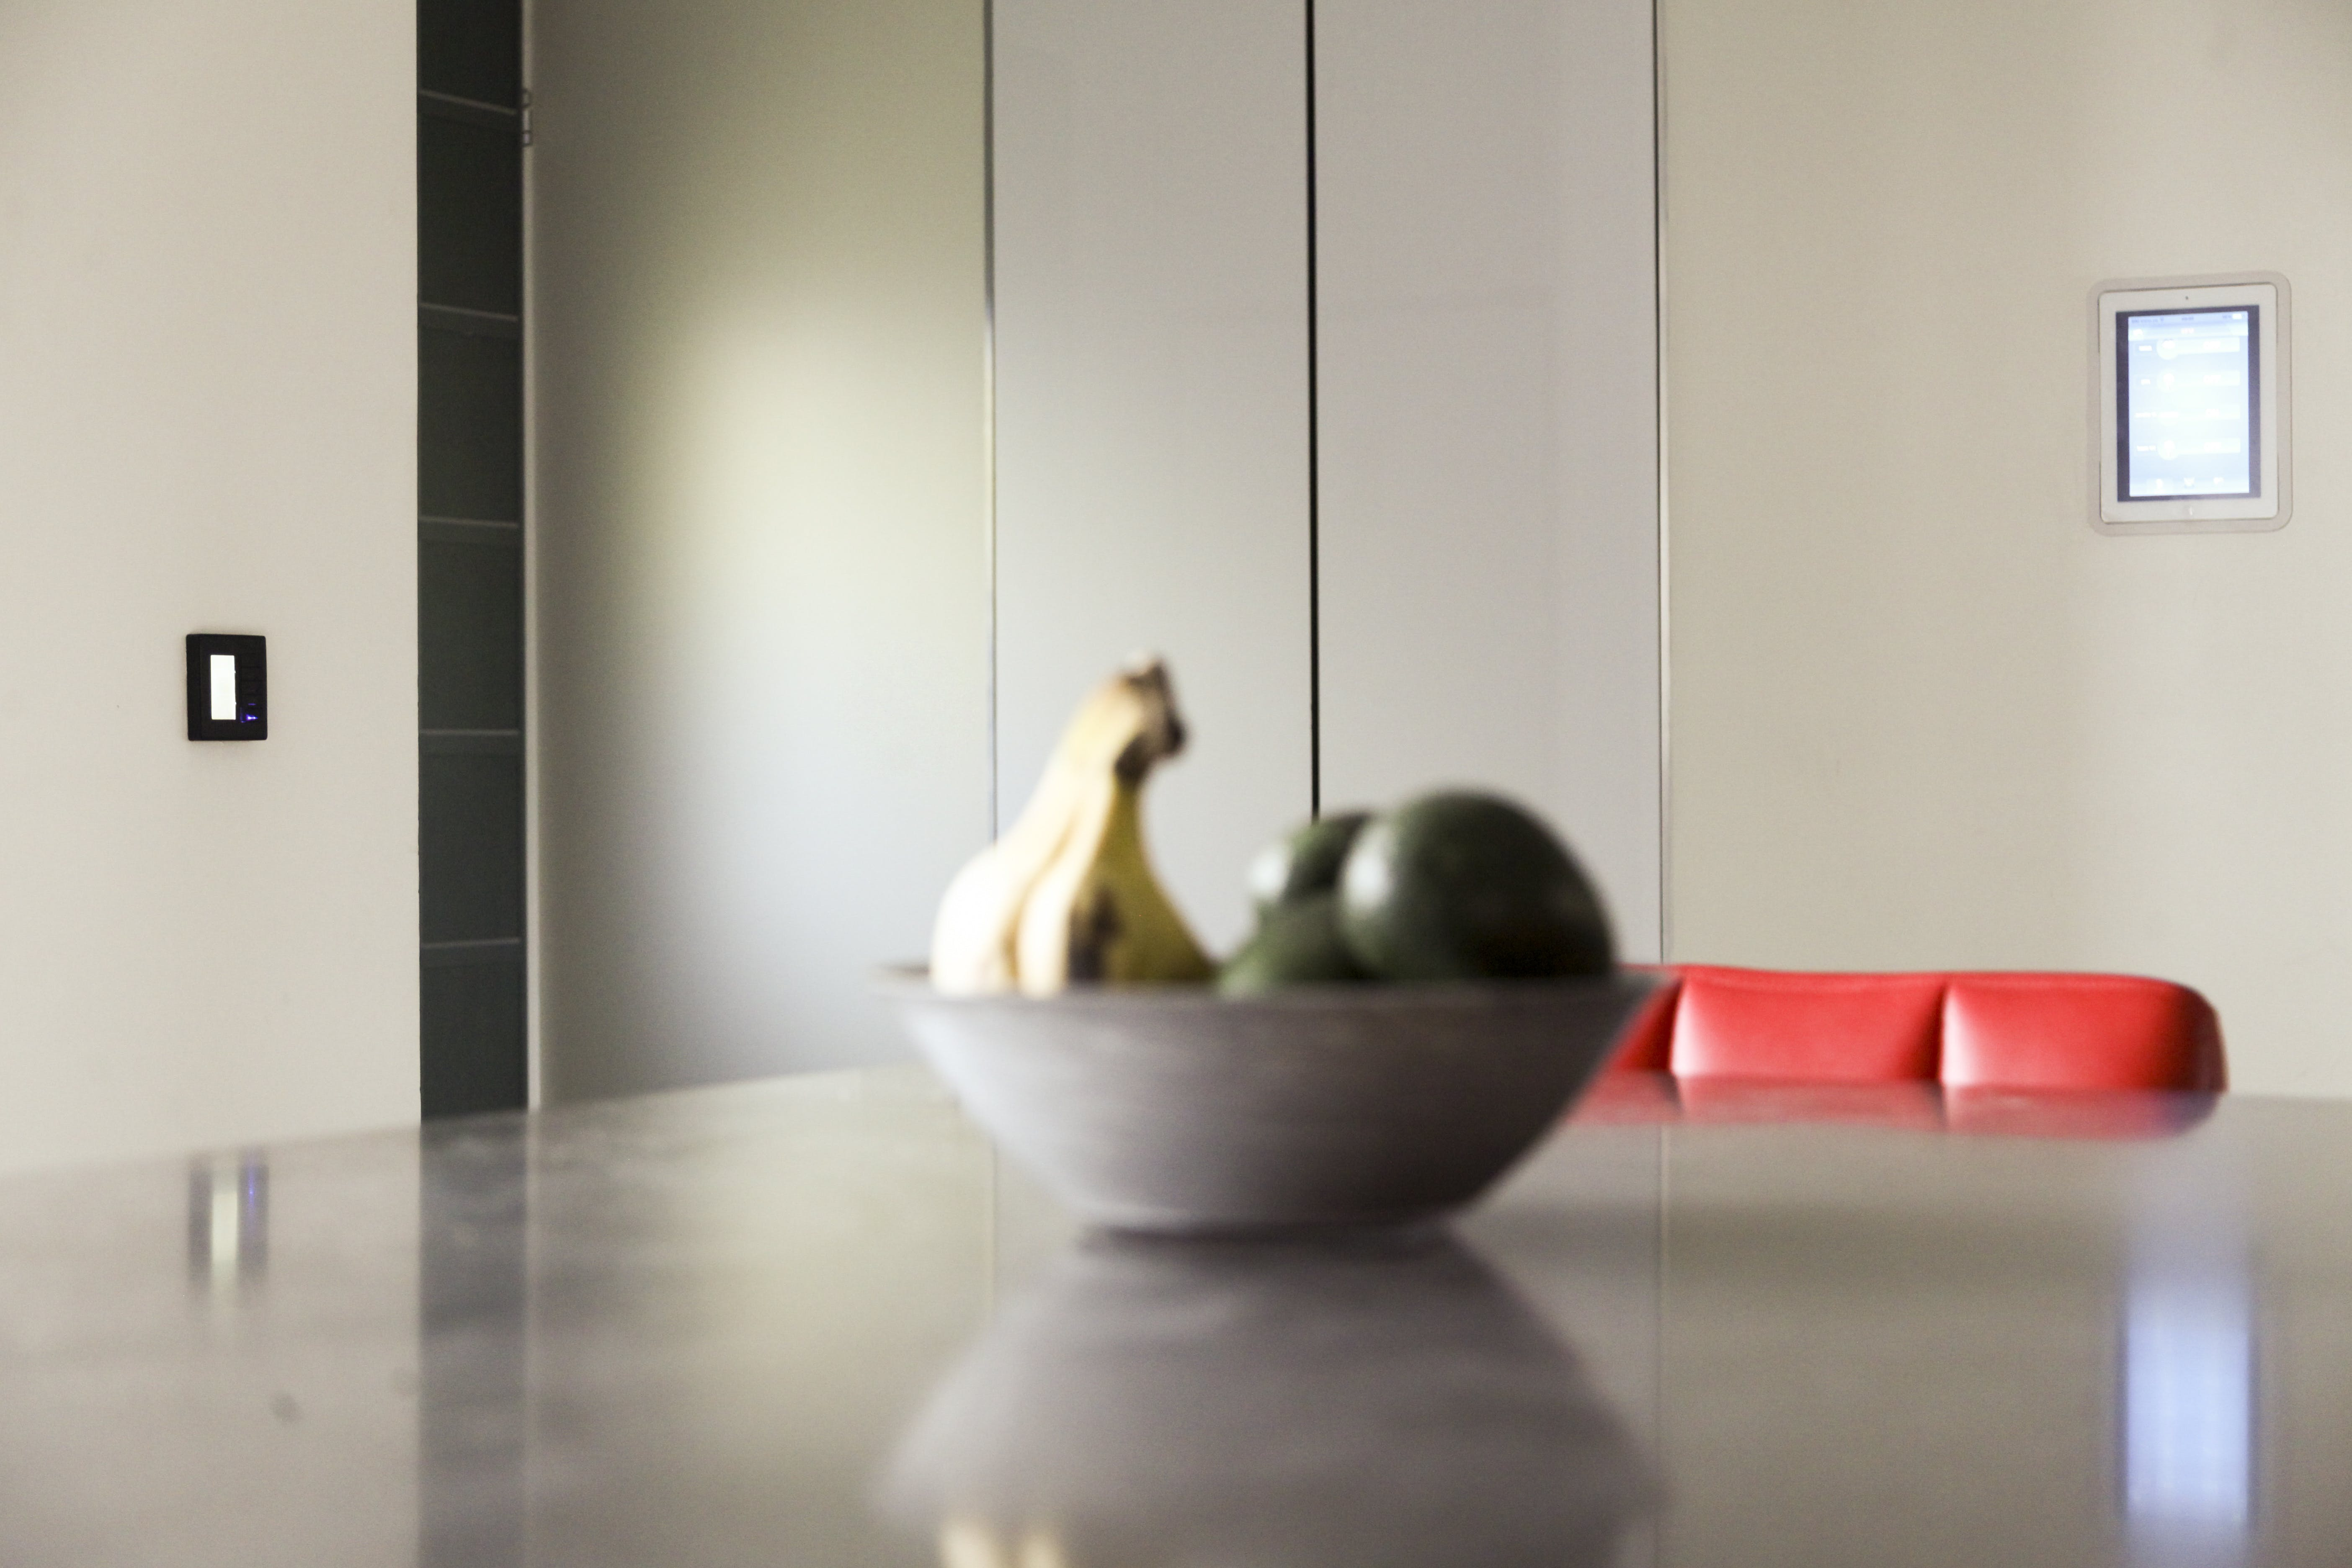 Free stock photo of kitchen, home, banana, switch